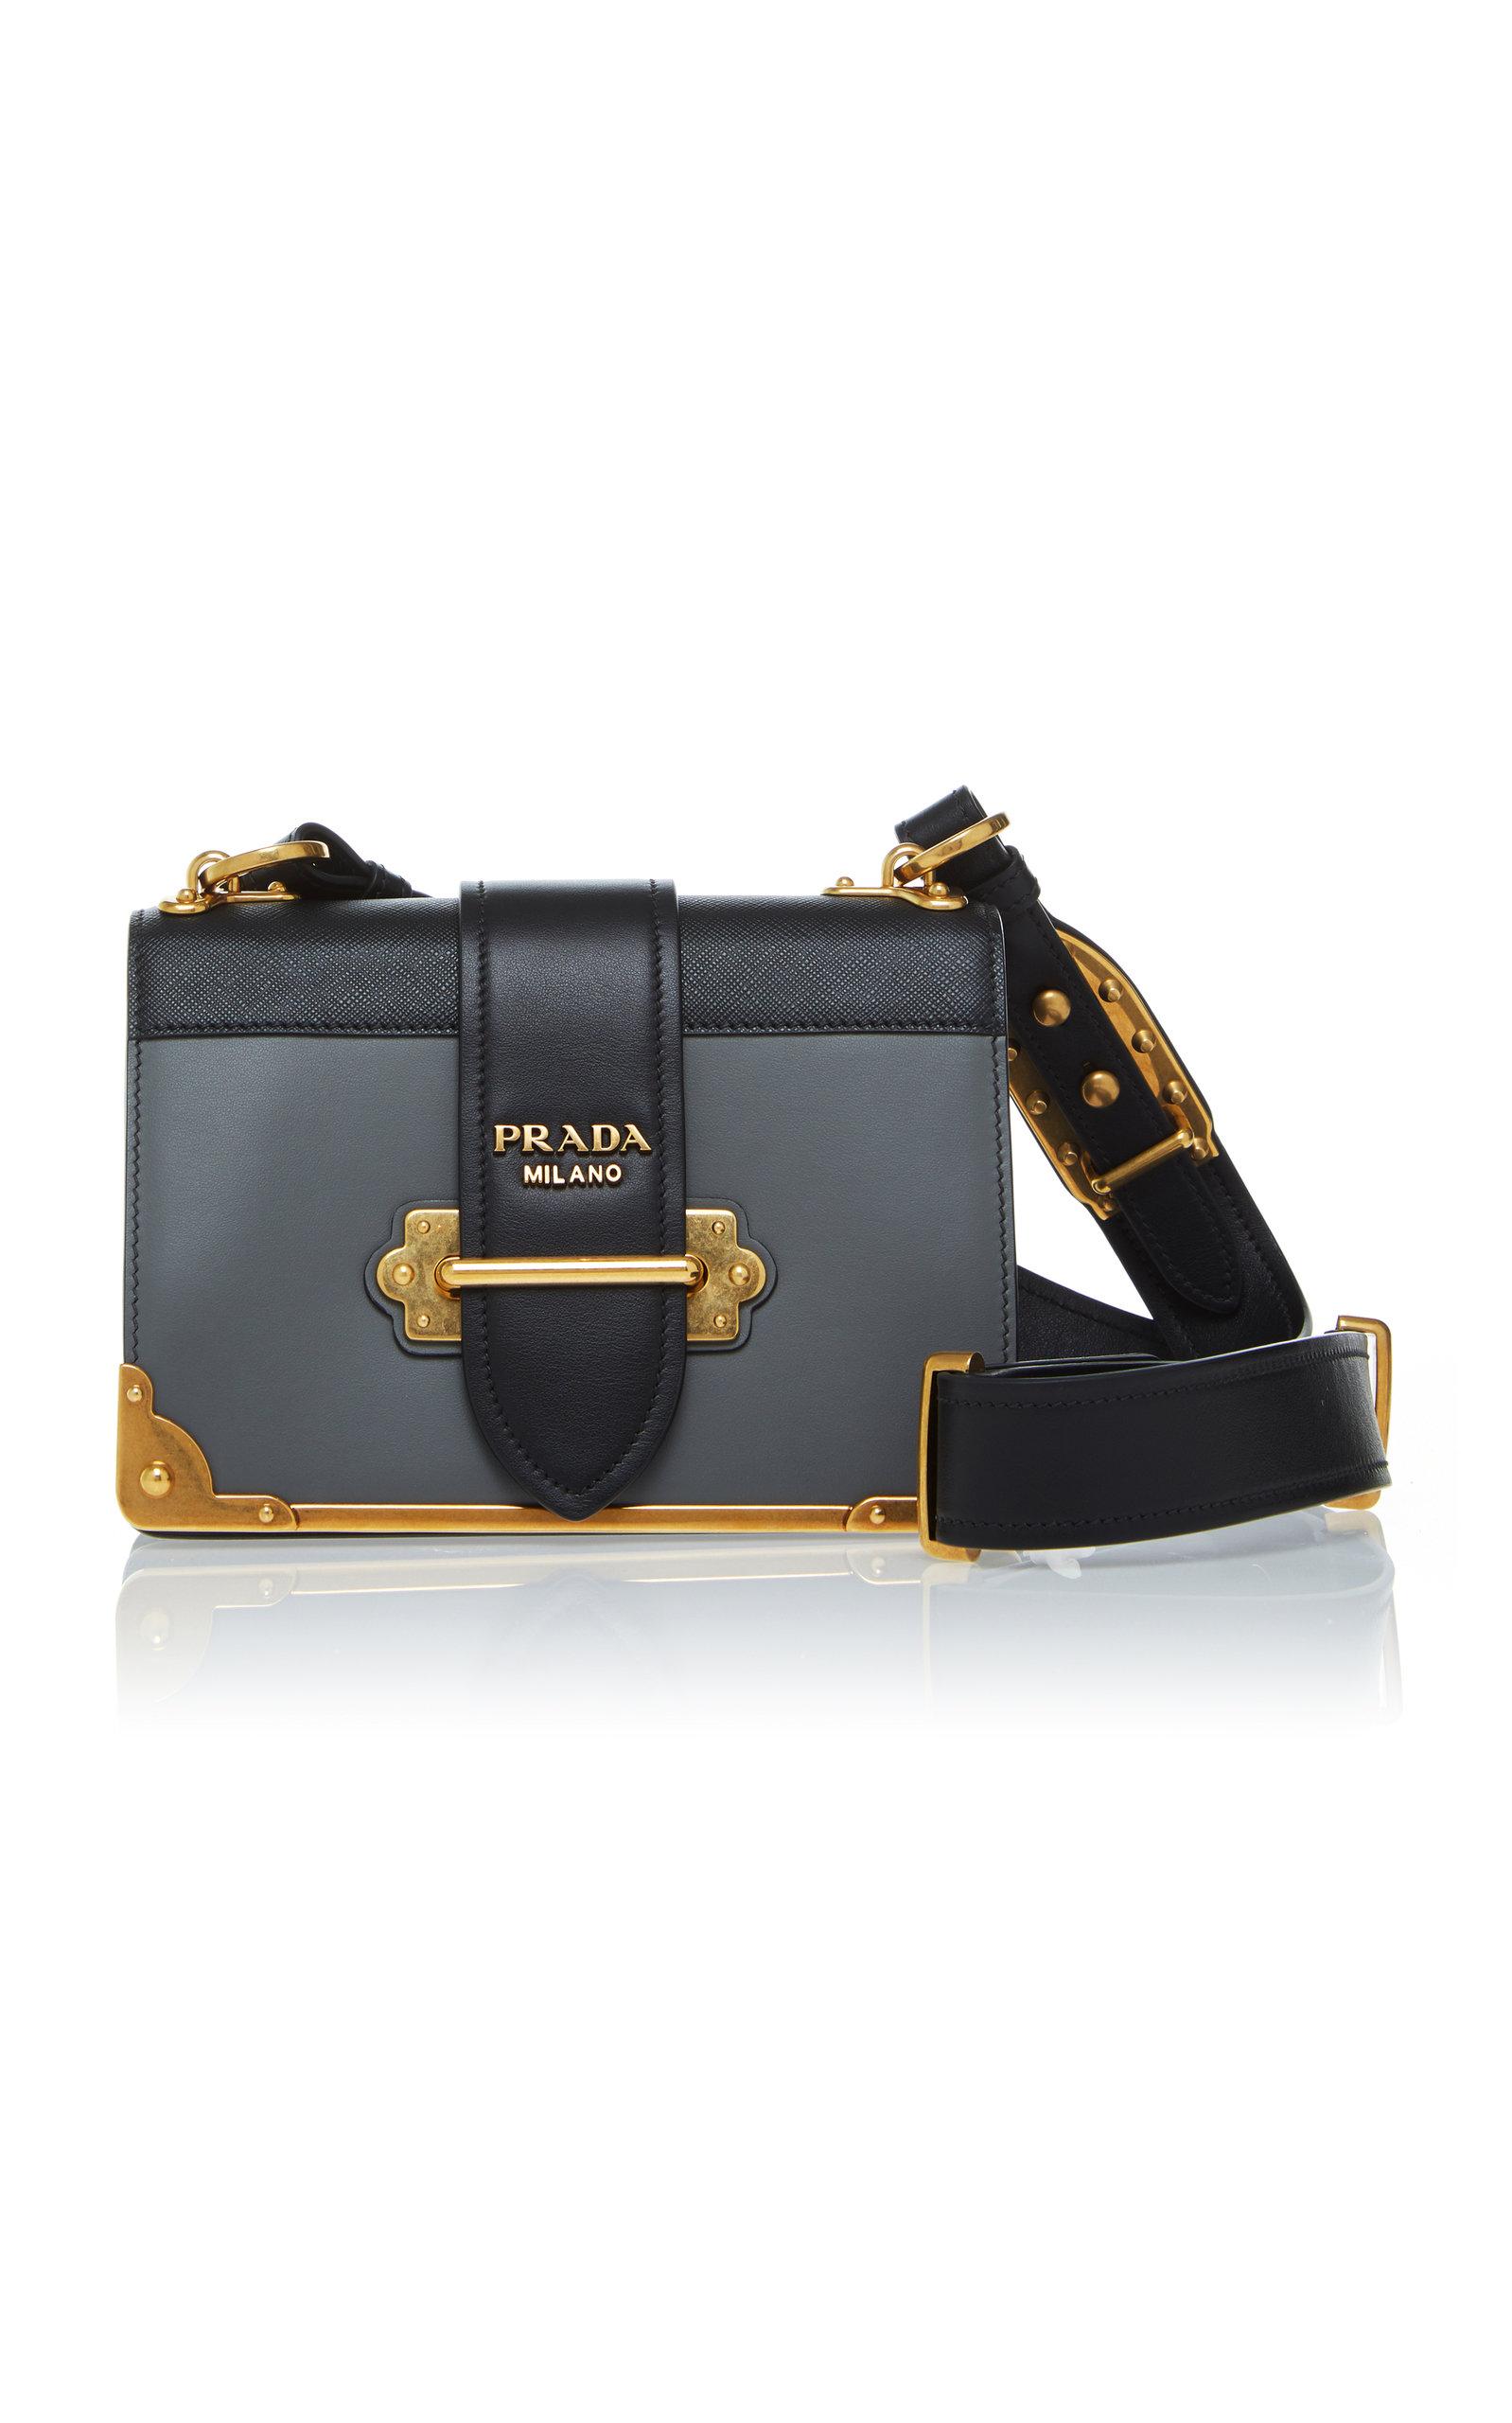 c68c8aefaf24 PradaCahier Two-Tone Leather Shoulder Bag. CLOSE. Loading